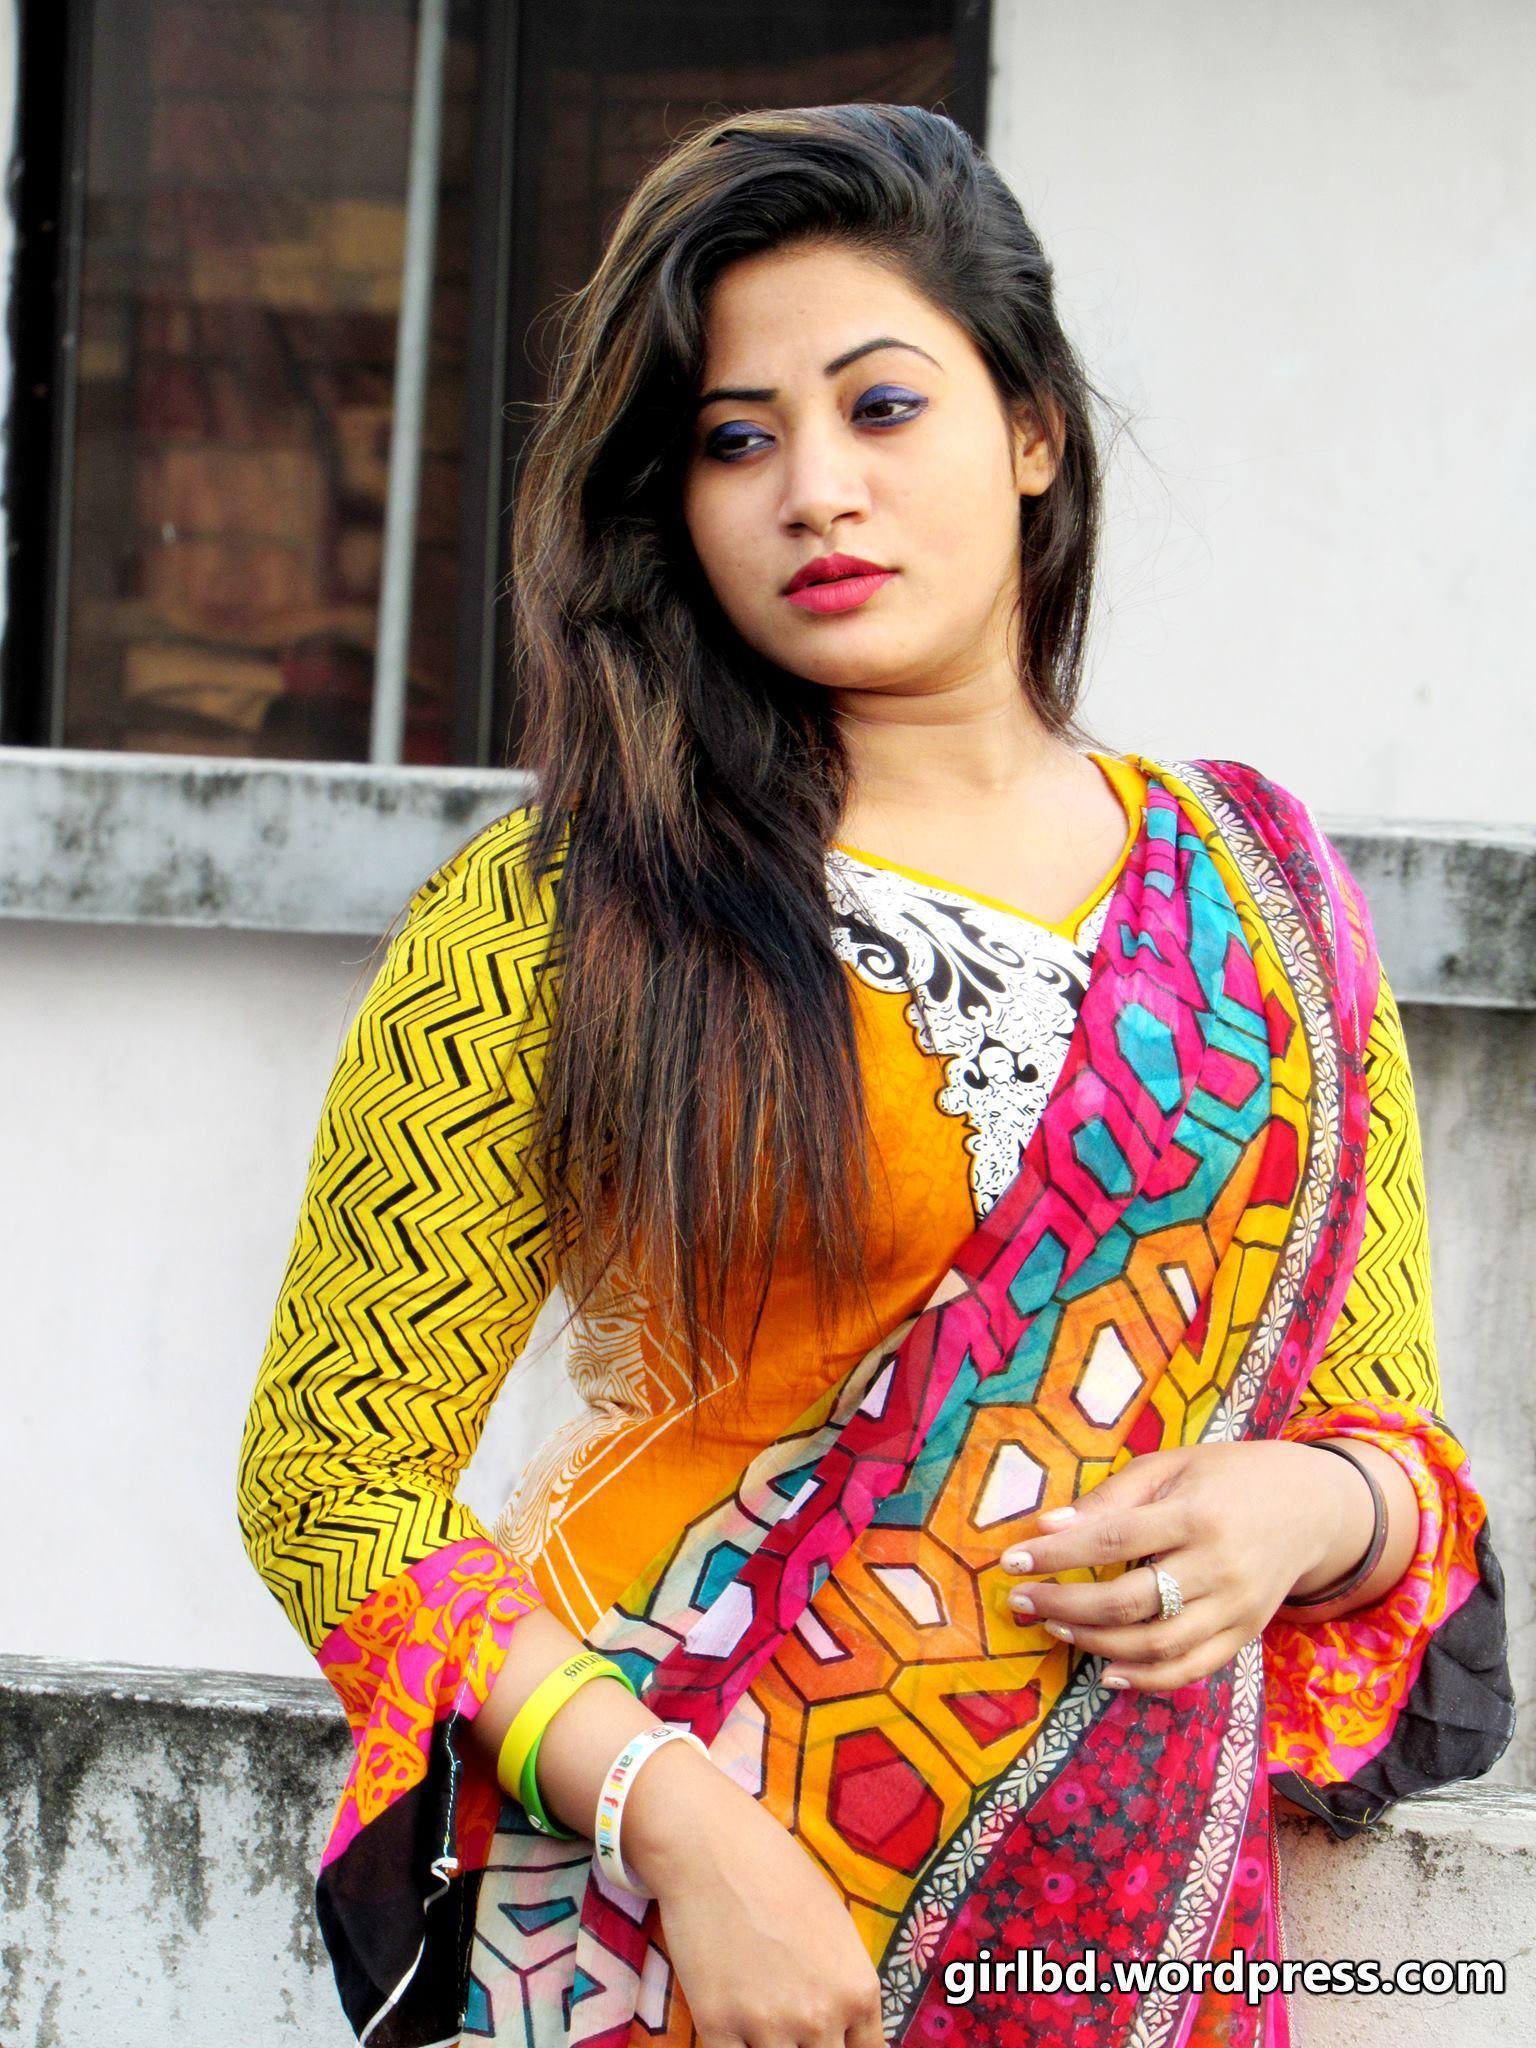 Bangladeshi Village girl photo - YouTube